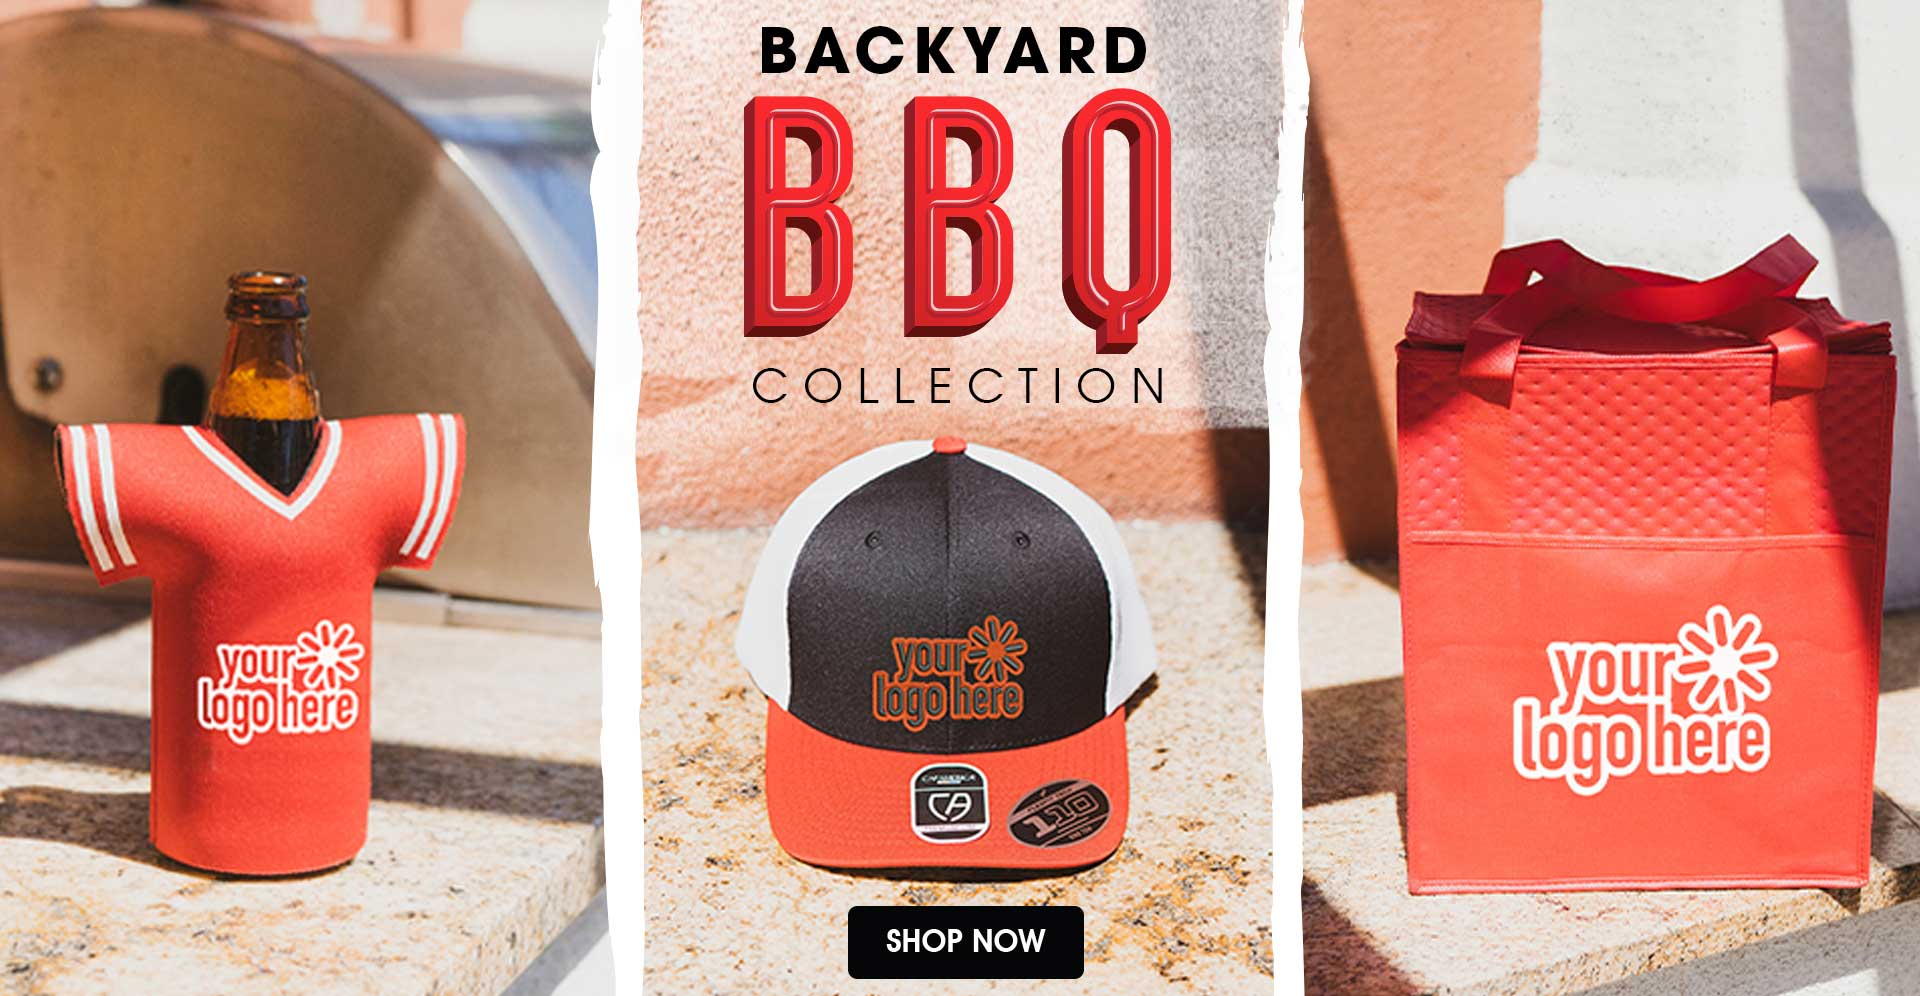 backyard bbq collection